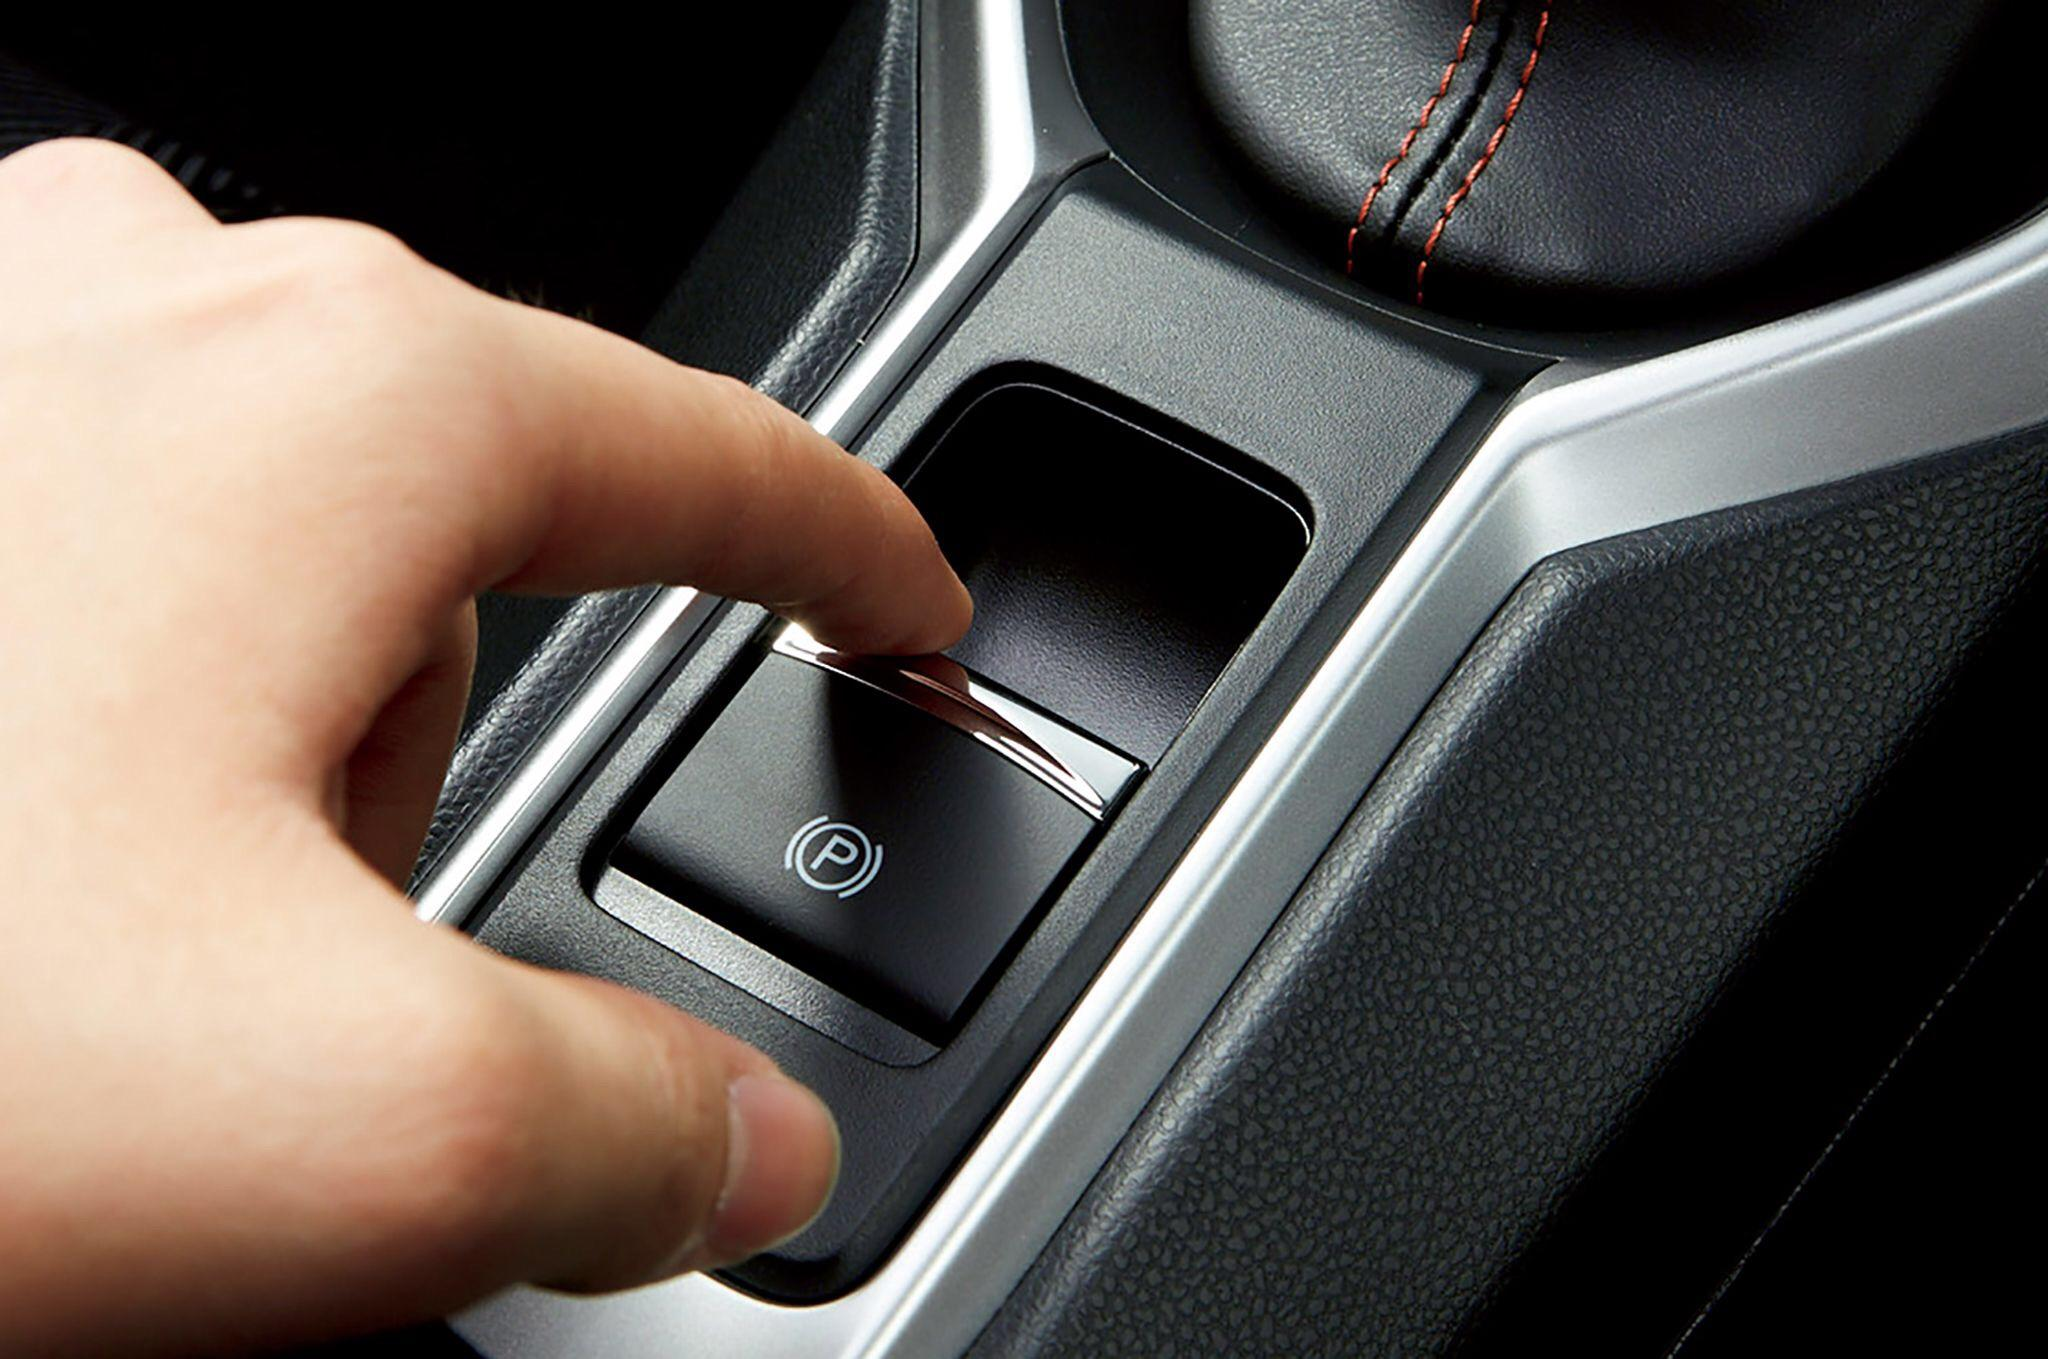 Elektromechanická parkovacia brzda – výhody, nevýhody